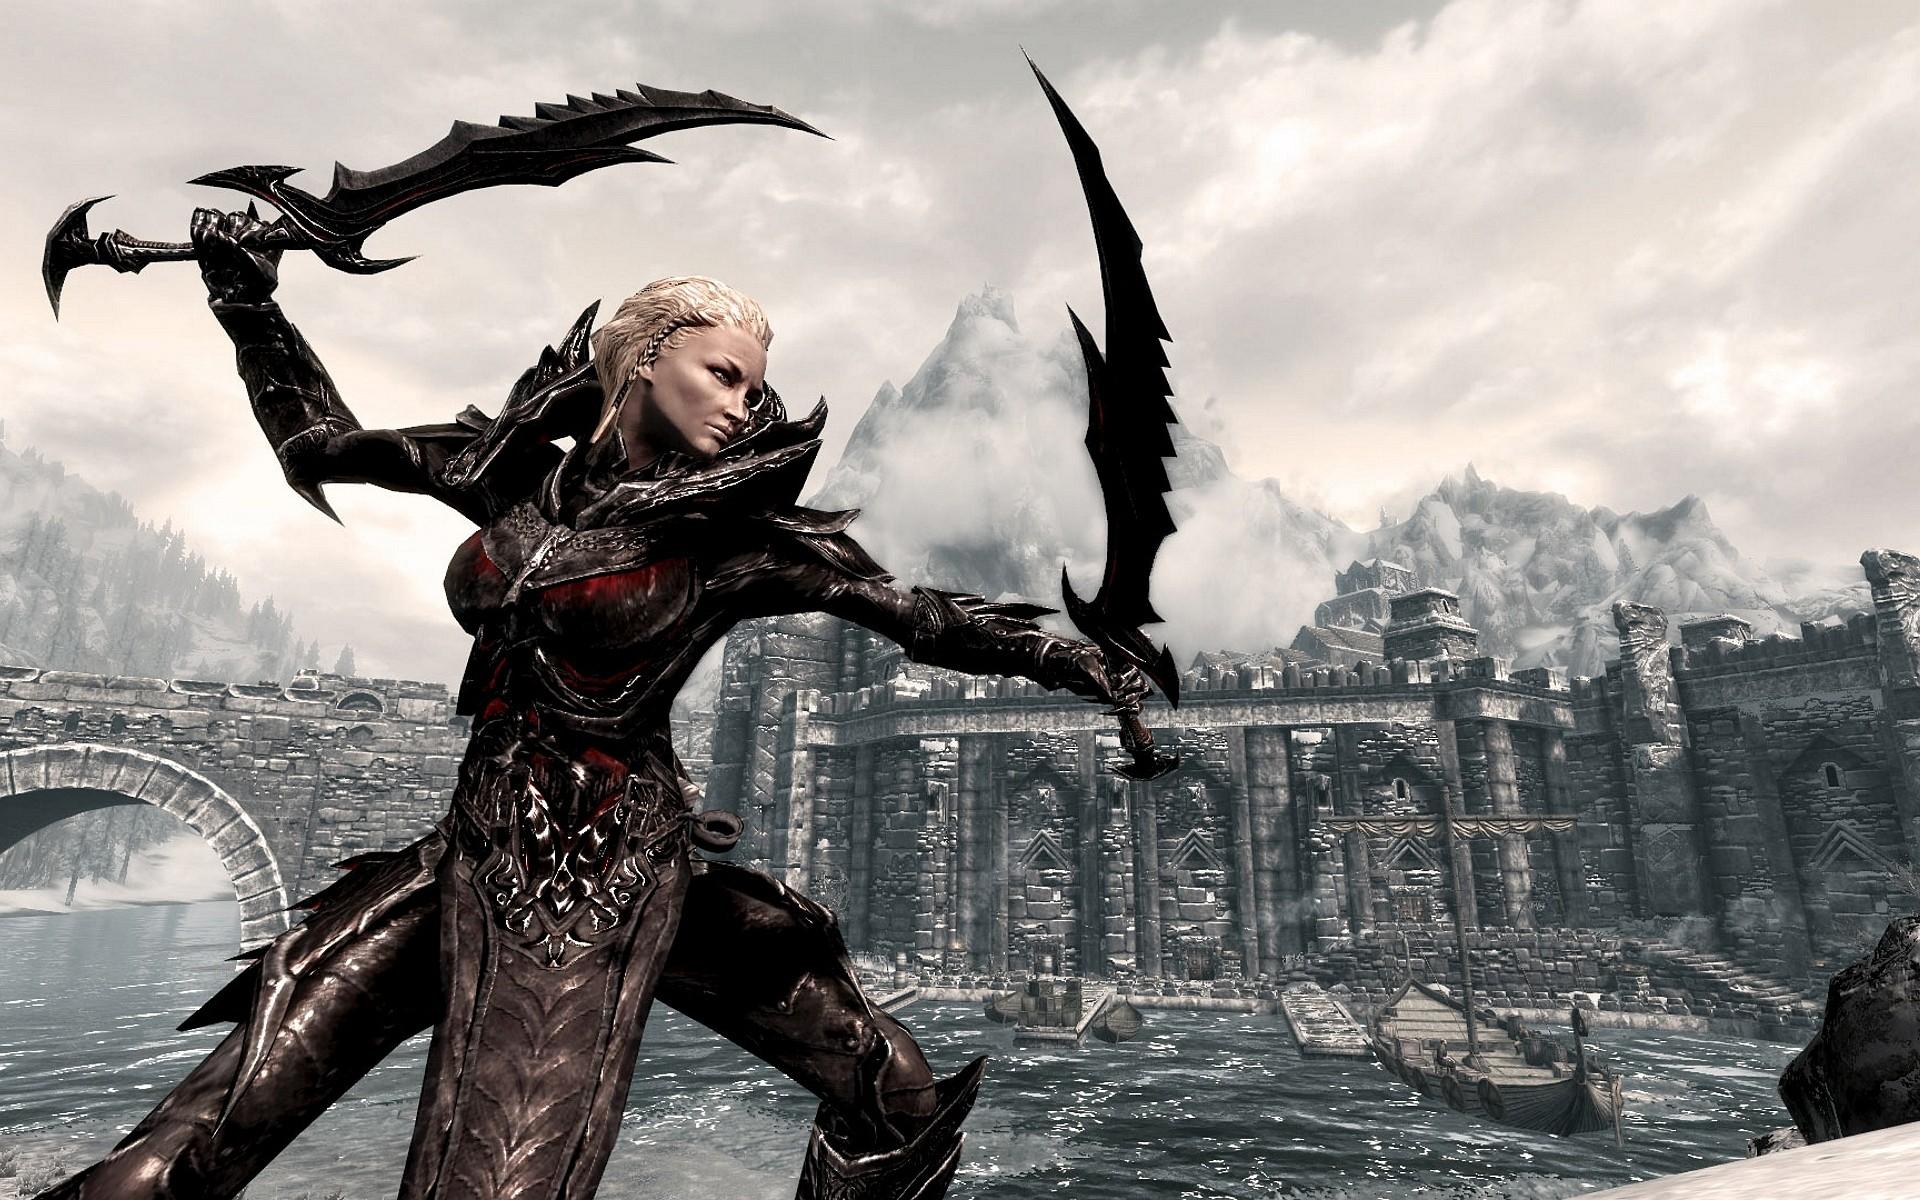 Best Picture skyrim daedric armor wallpaper – I Gamers Hood